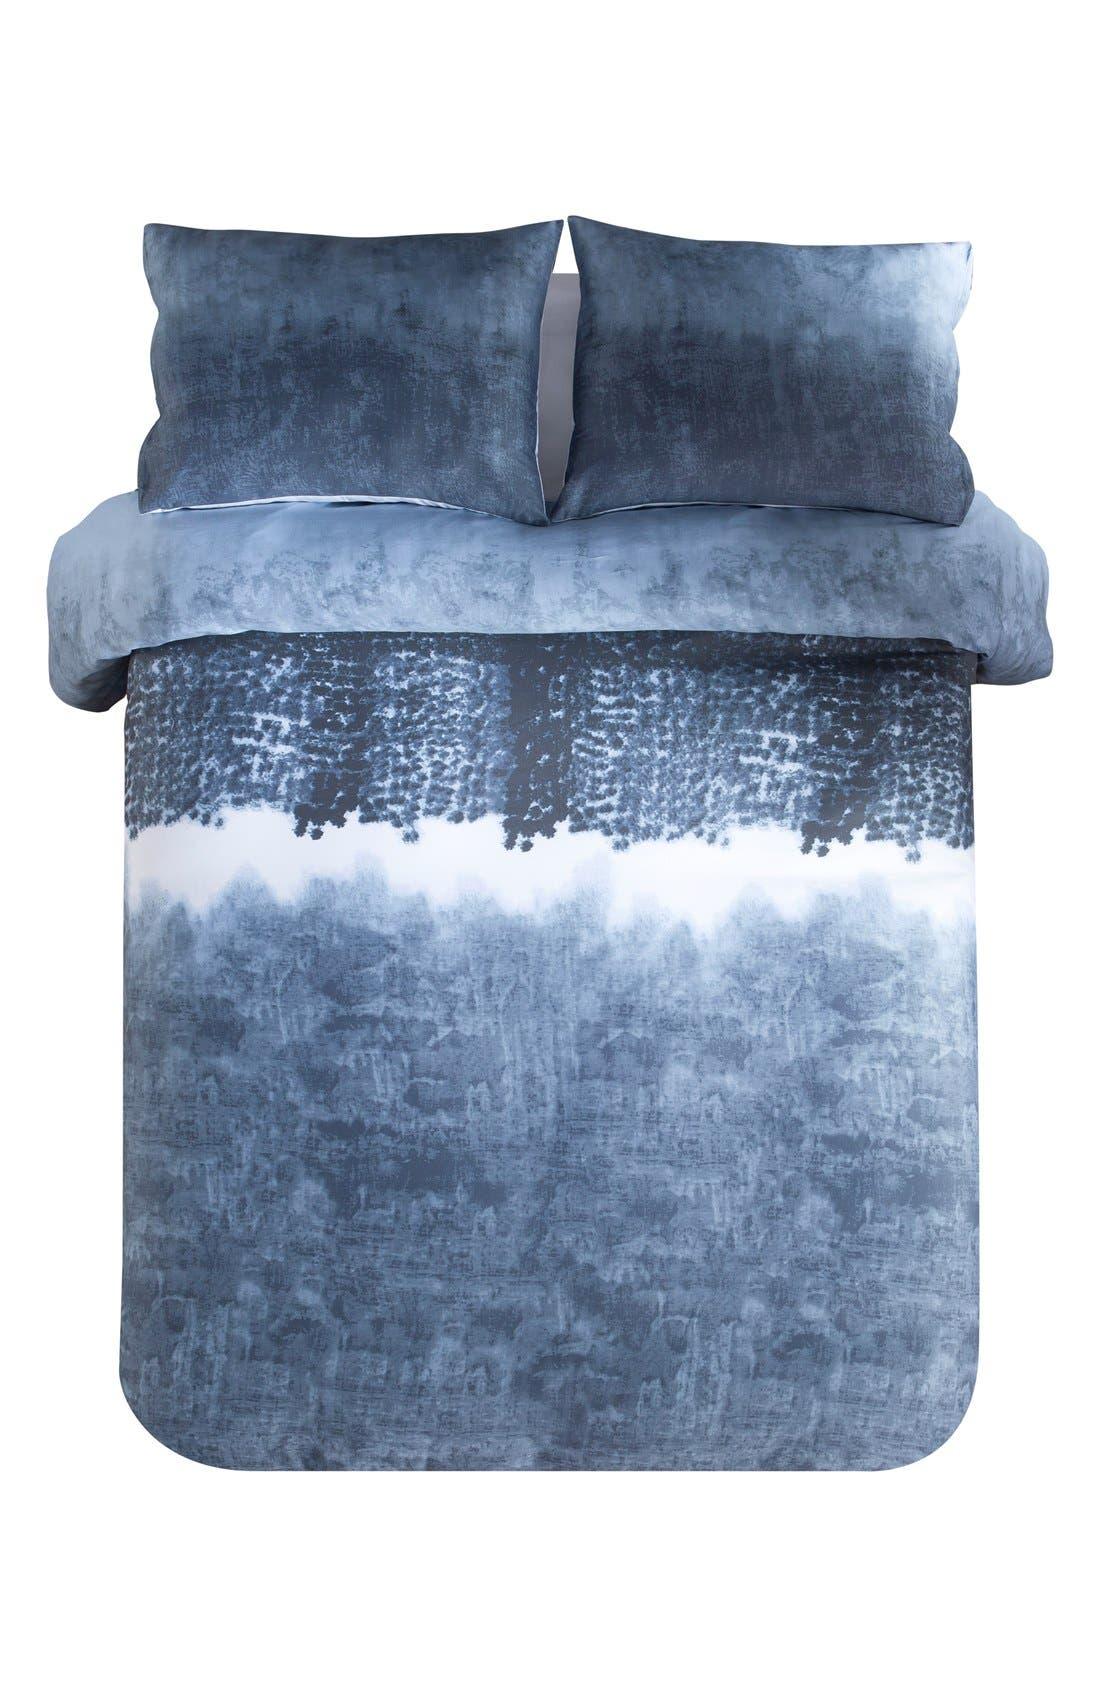 Janie 300 Thread Count Duvet Cover & Sham Set,                         Main,                         color, DENIM BLUE